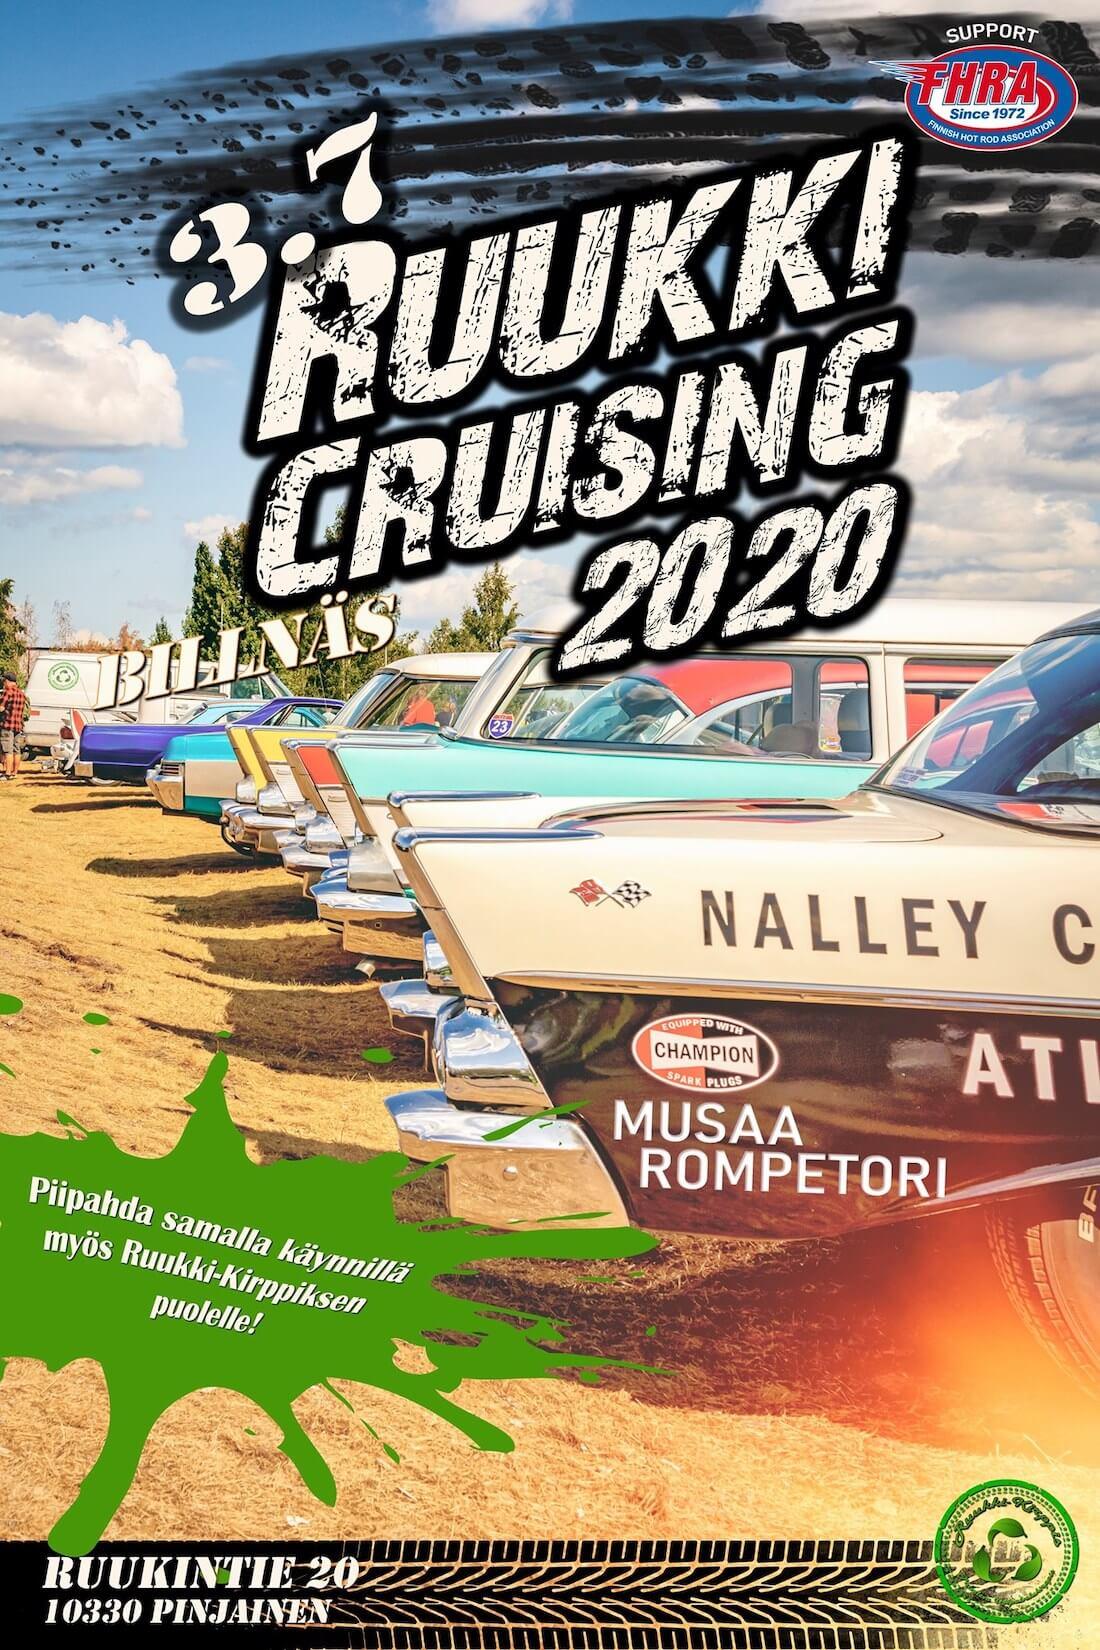 Ruukki Cruising 3.7.2020 mainosjuliste